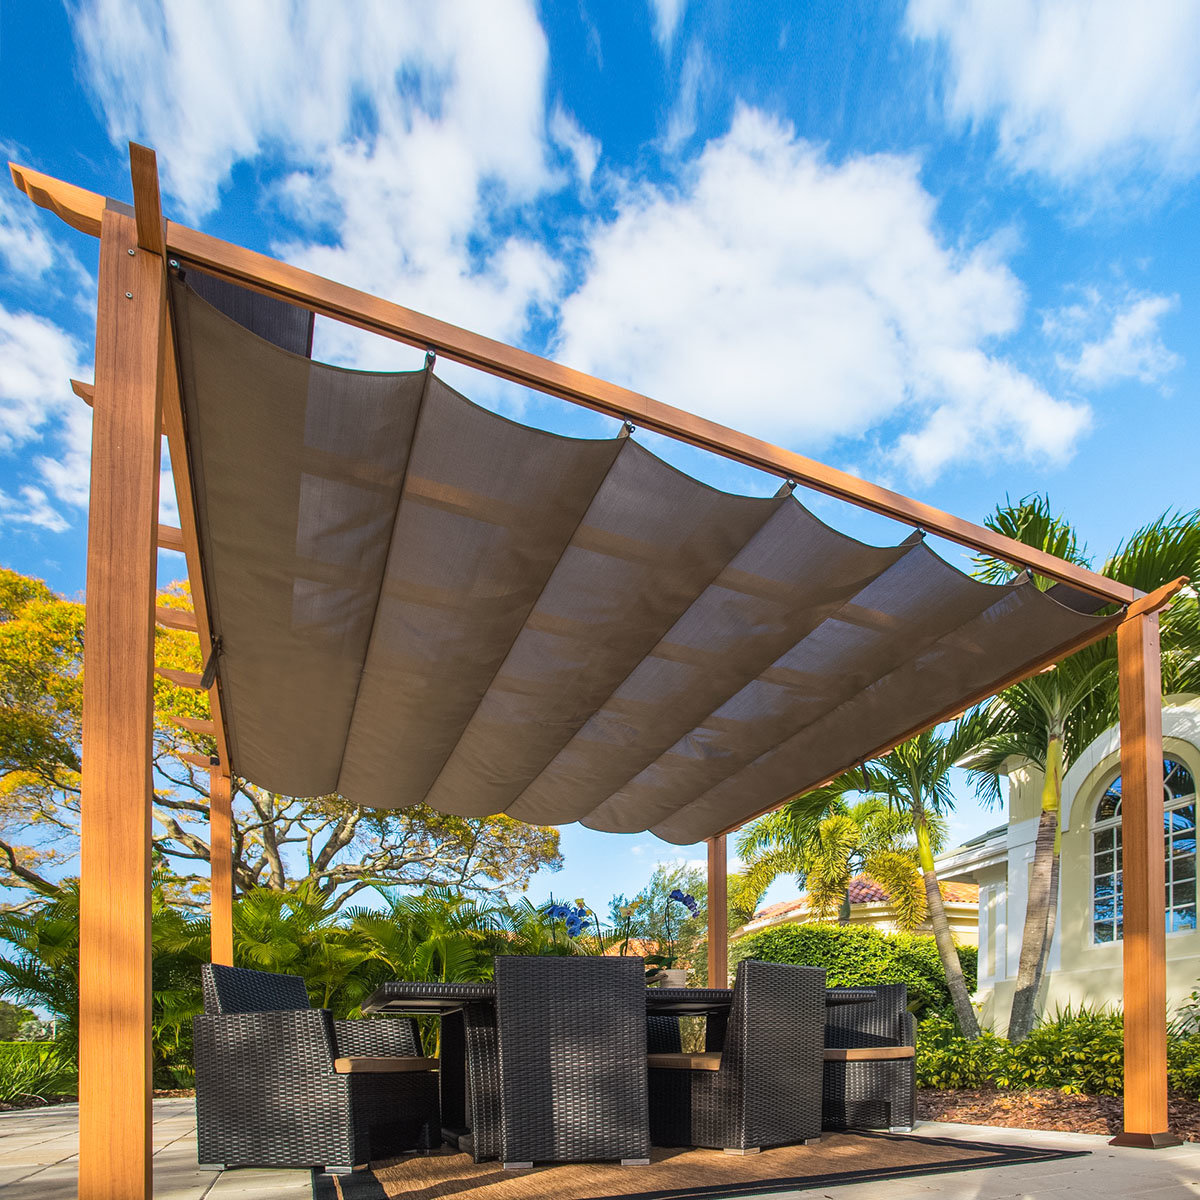 Pavillon Florida 11x11 | #3